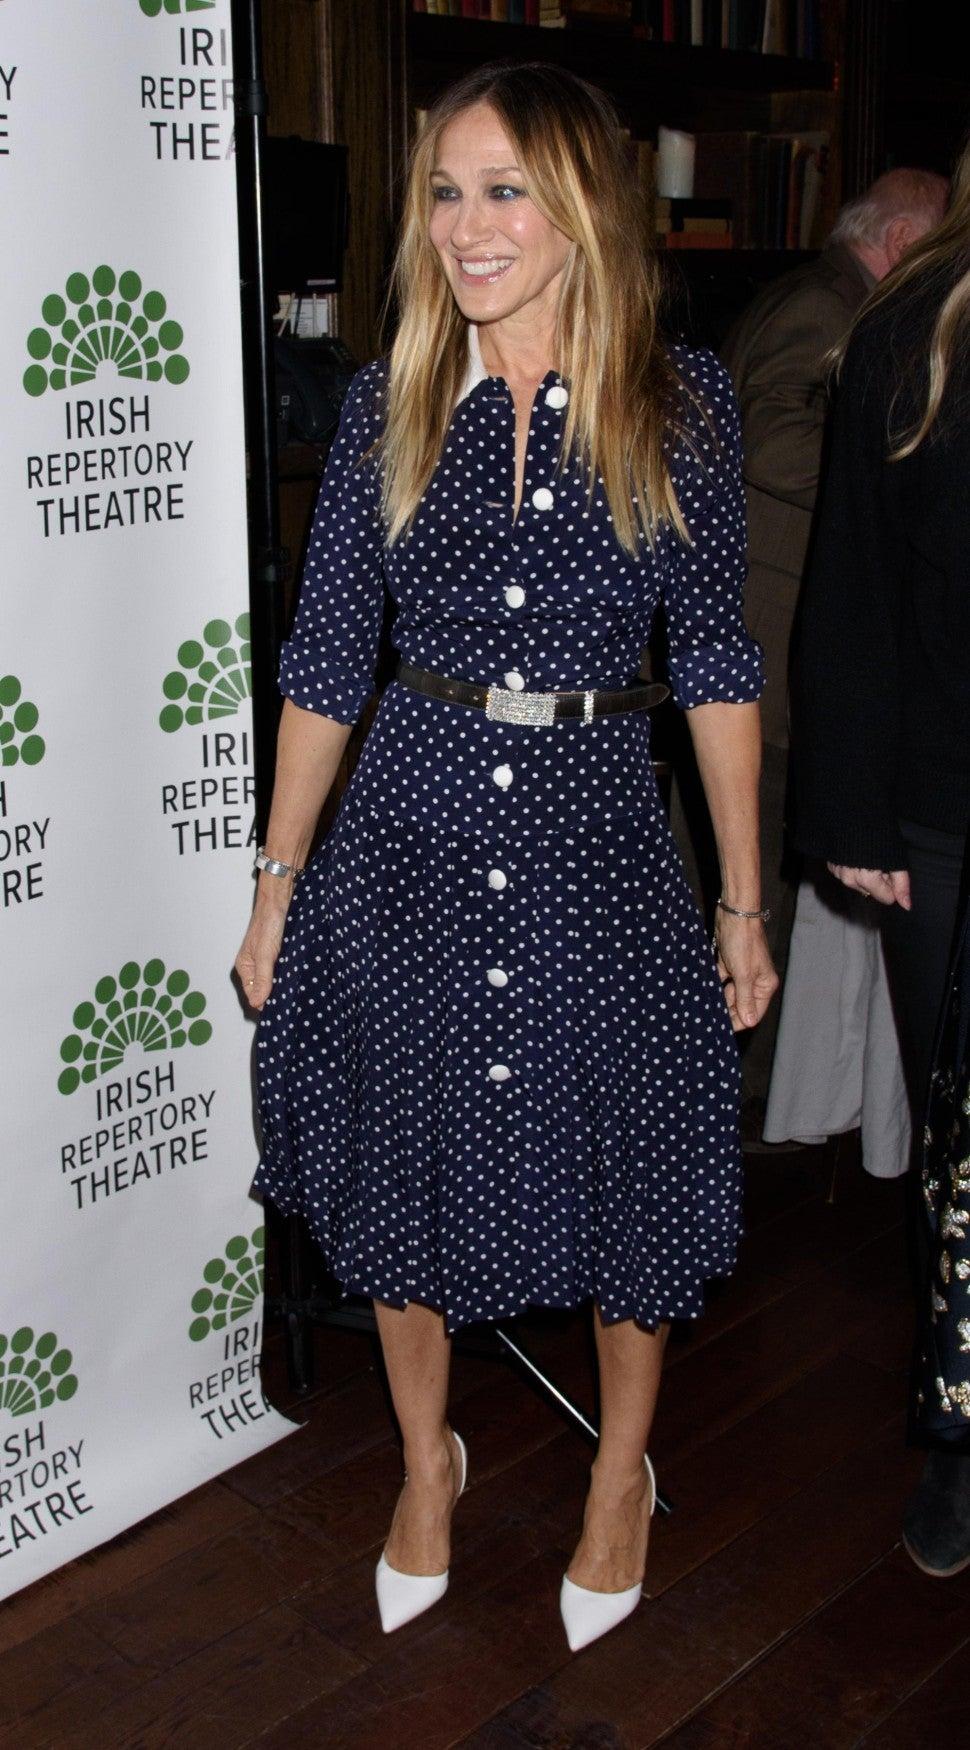 Kate Middleton S Polka Dot Dress Is The Same One Abigail